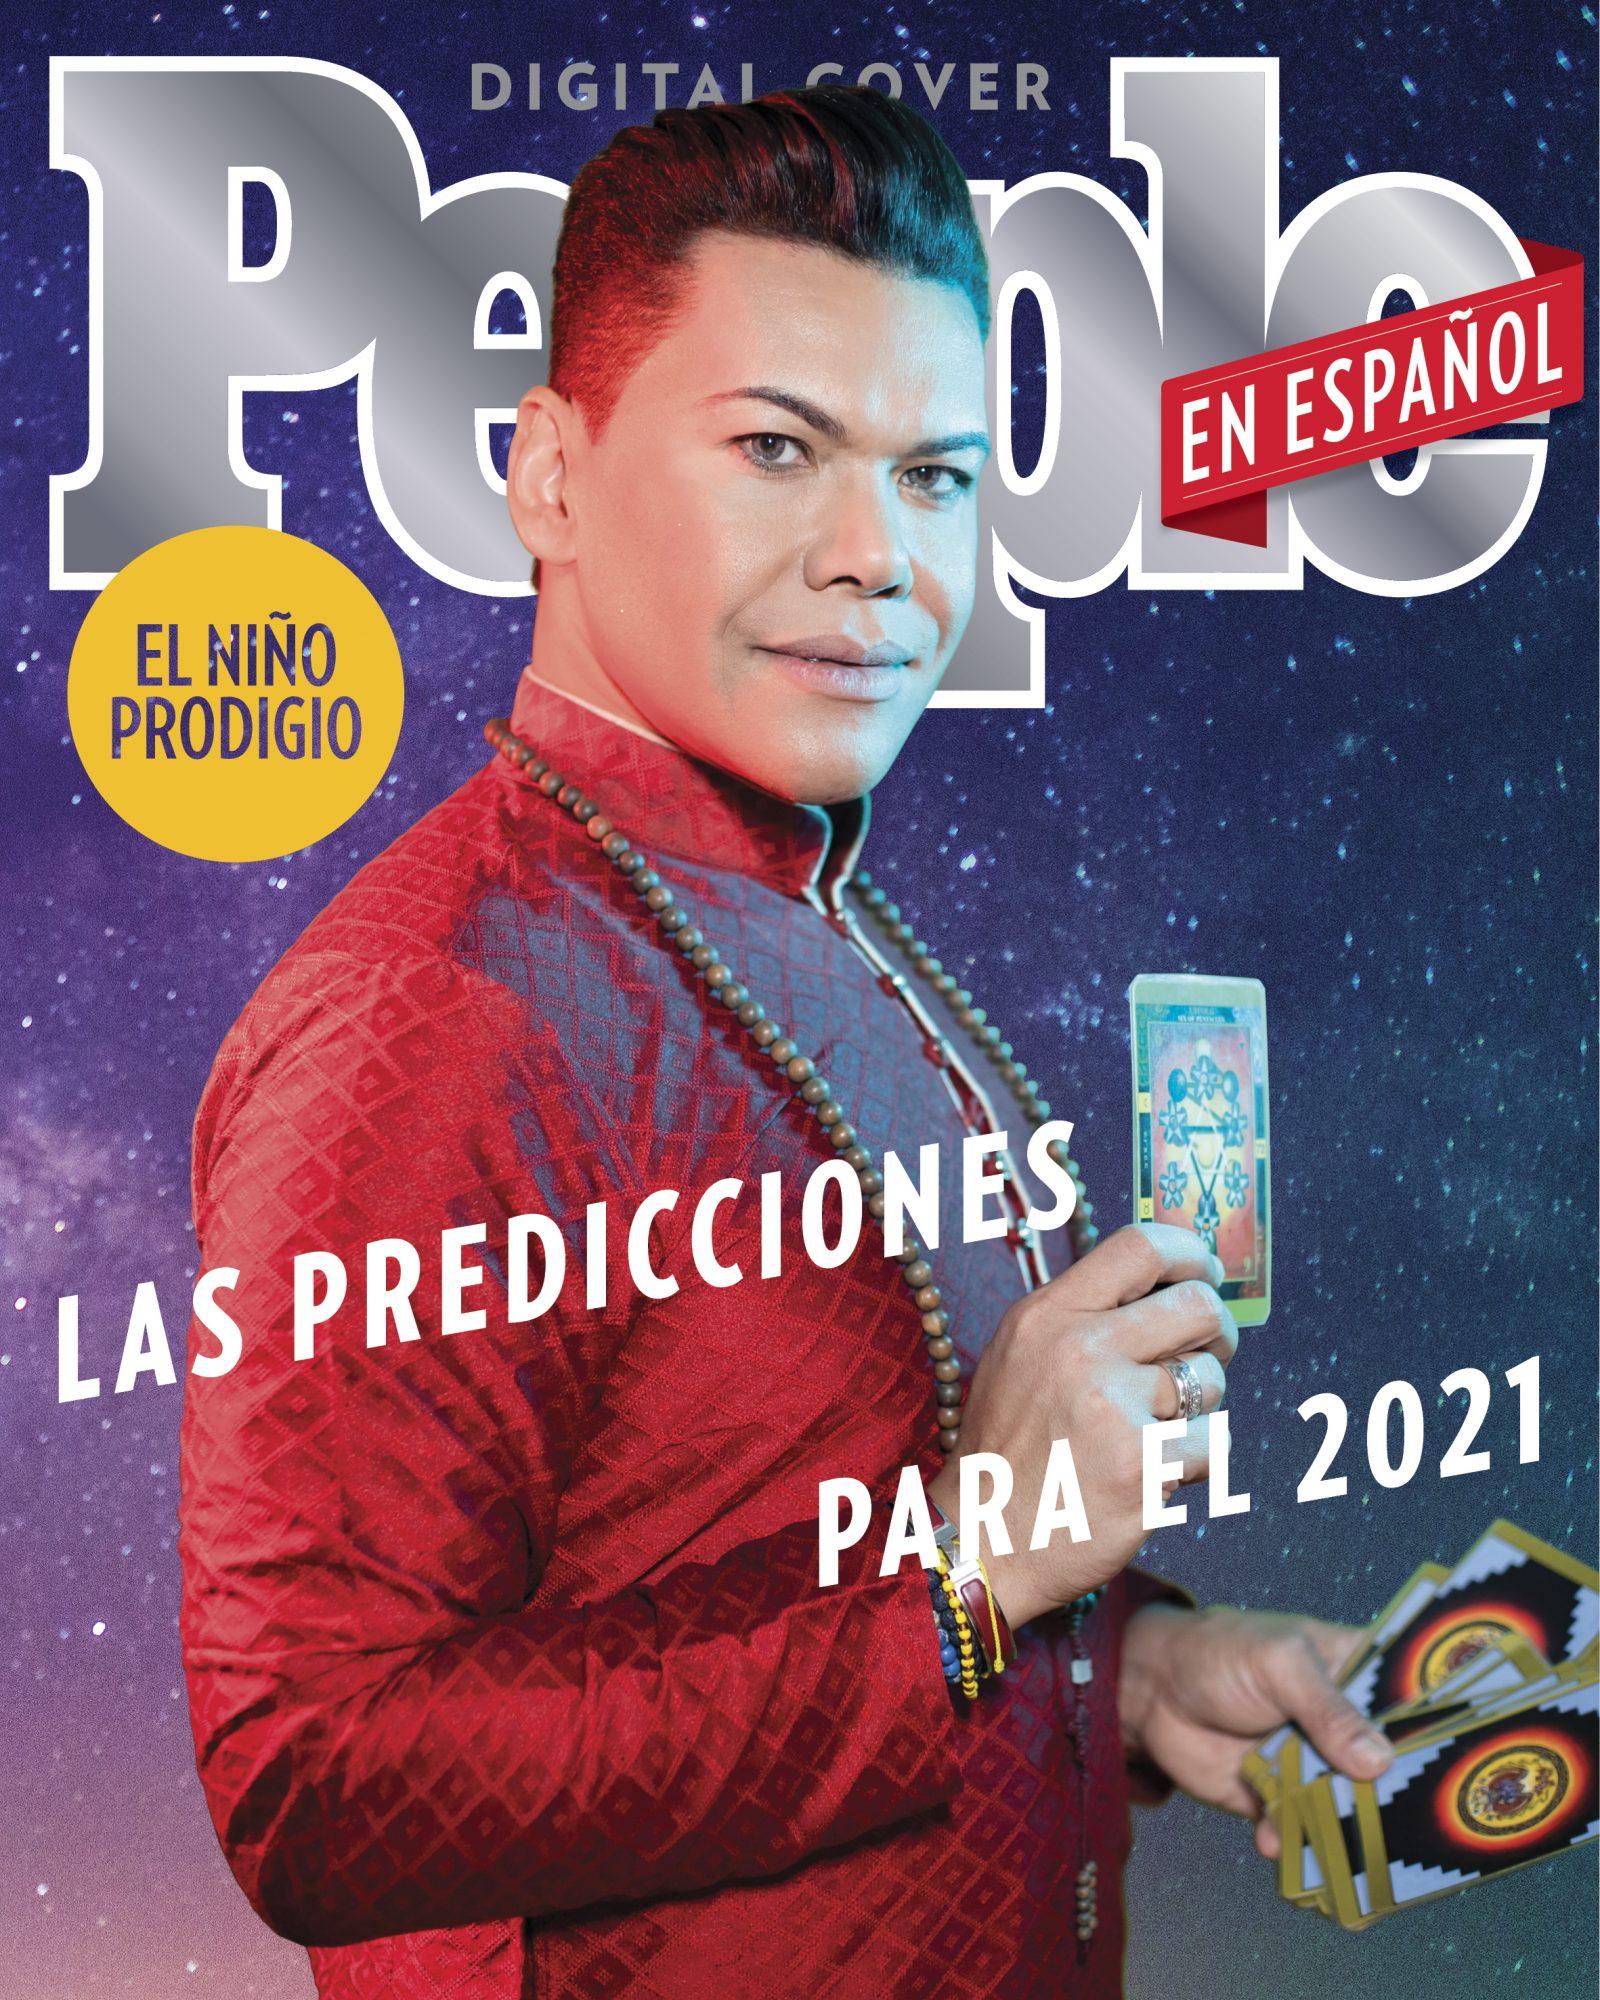 Niño Prodigio - Digital Cover